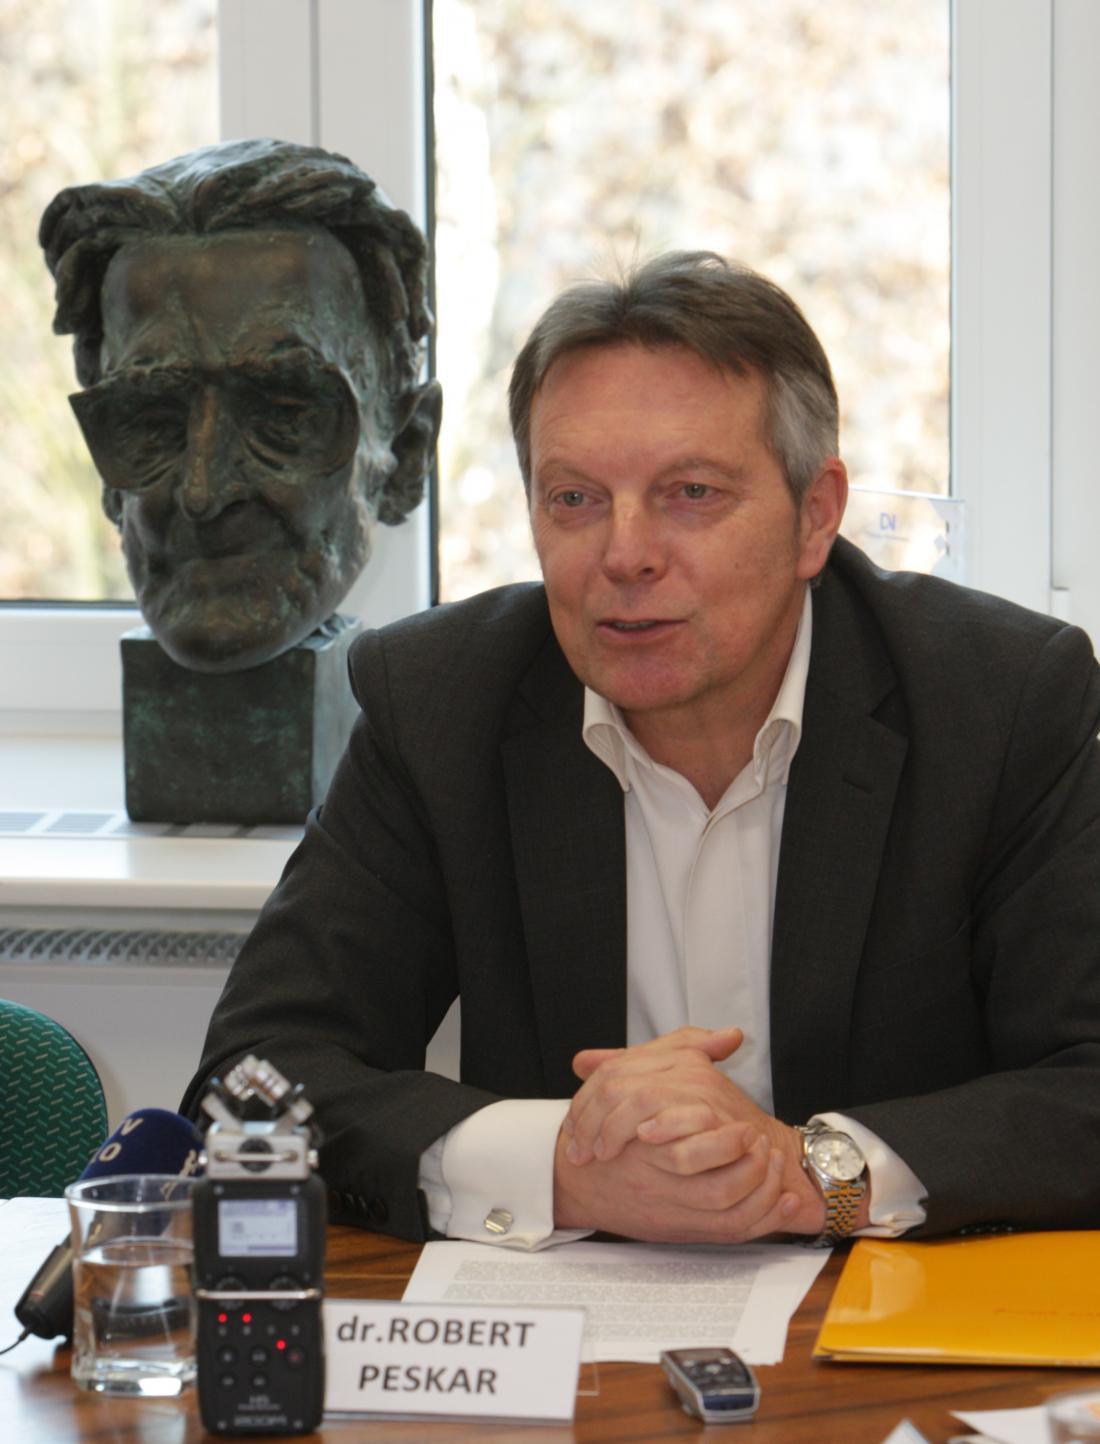 Dr. Robert Peskar